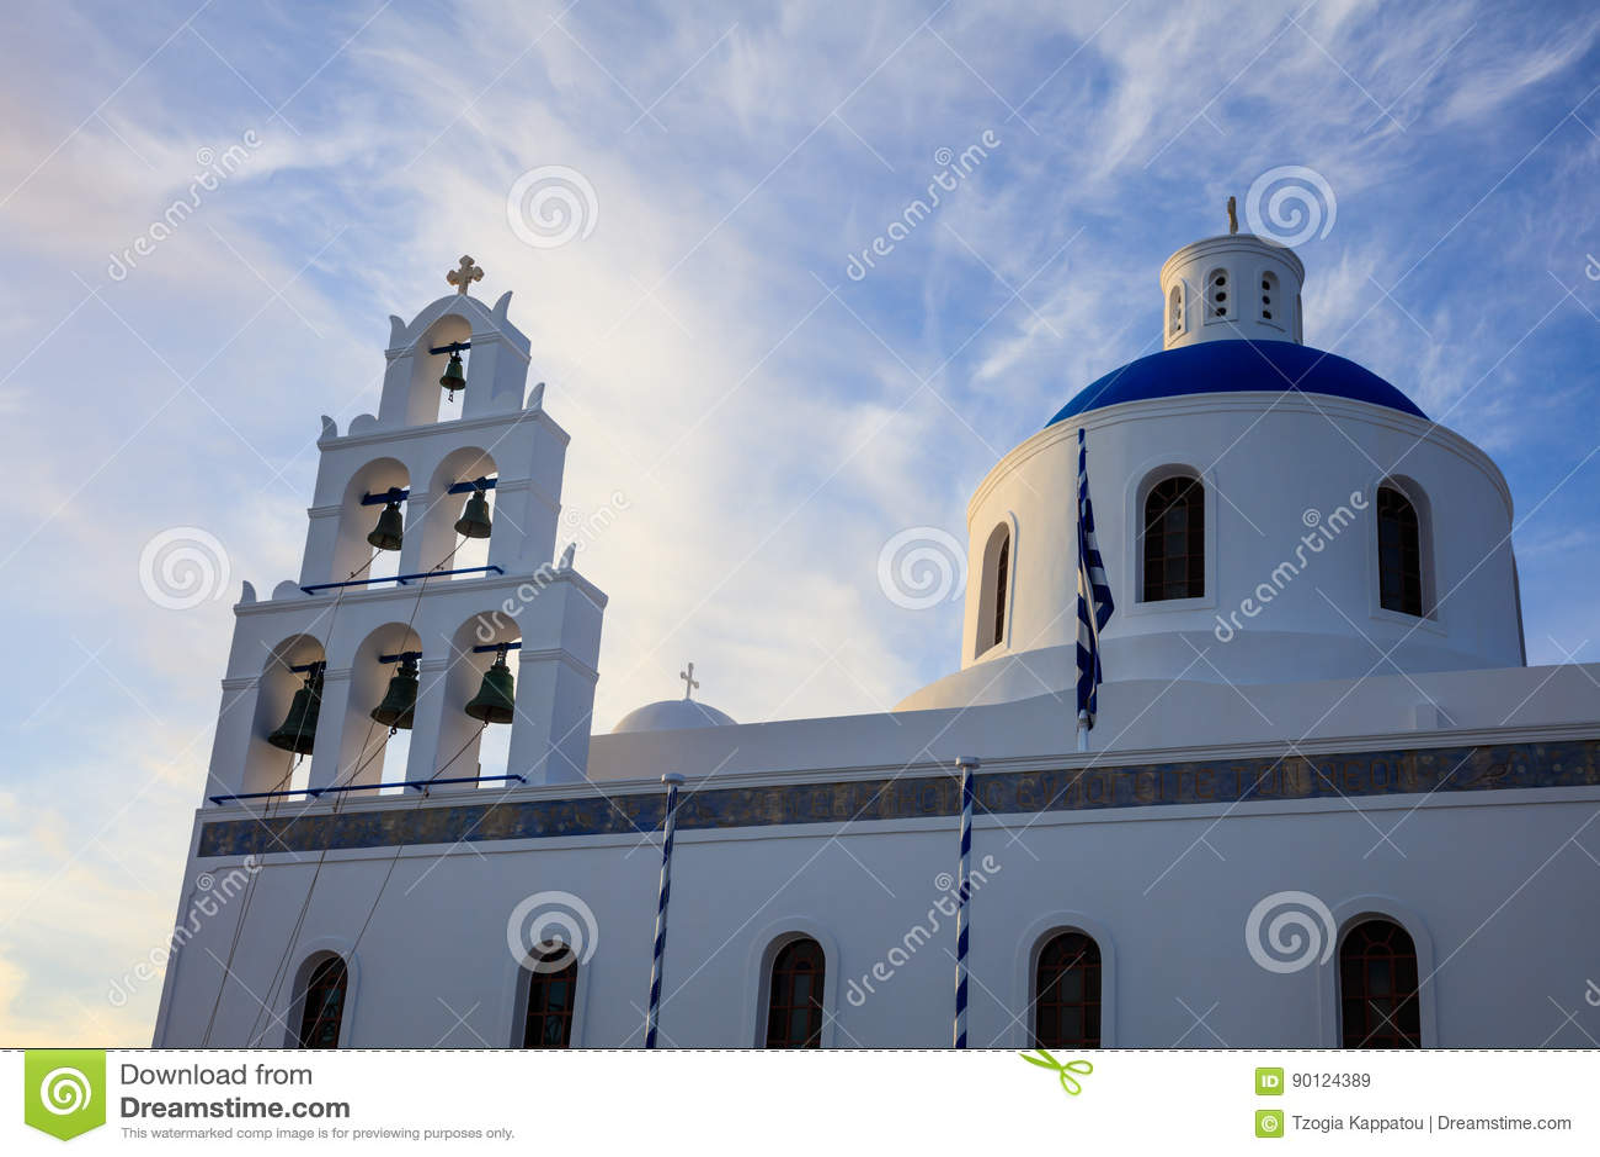 White church with blue dome in Santorini, Greece